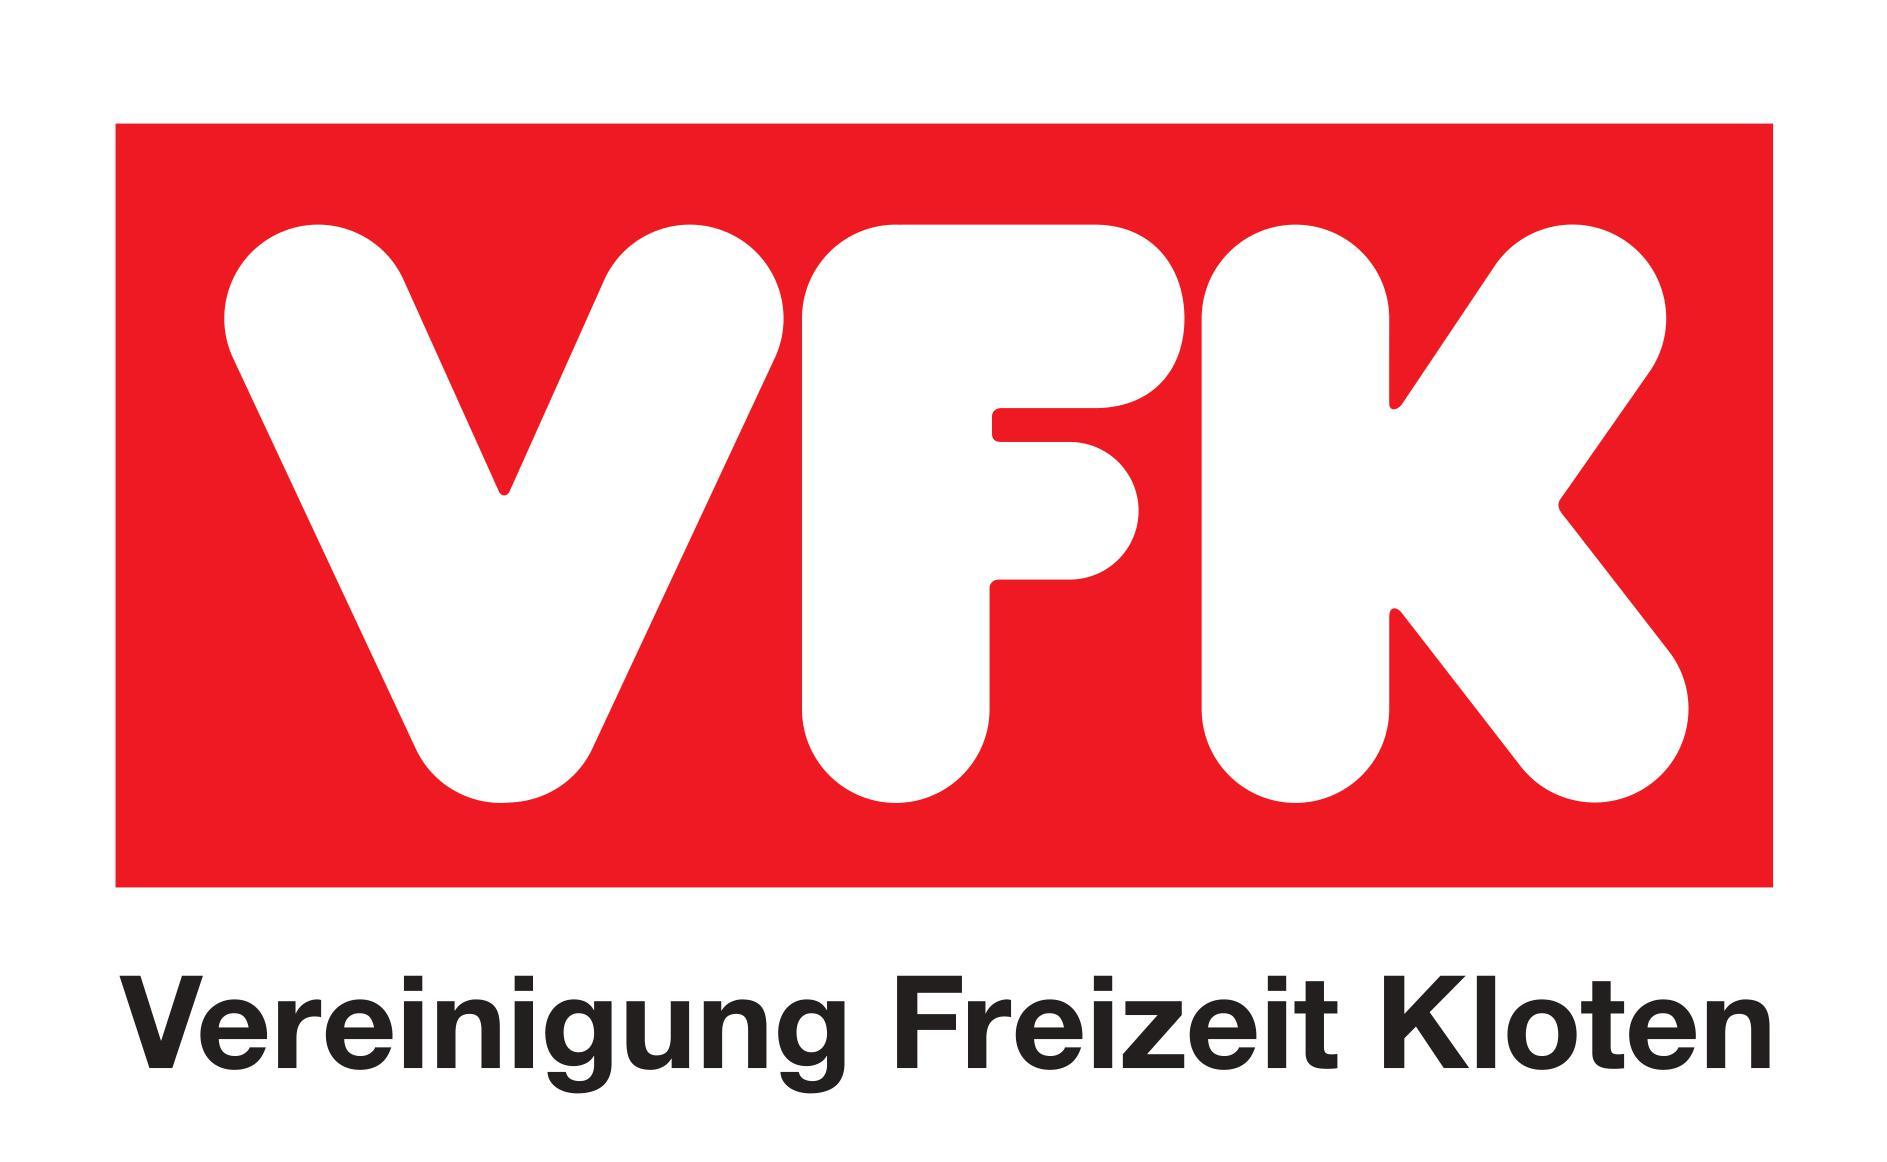 VFK Kloten